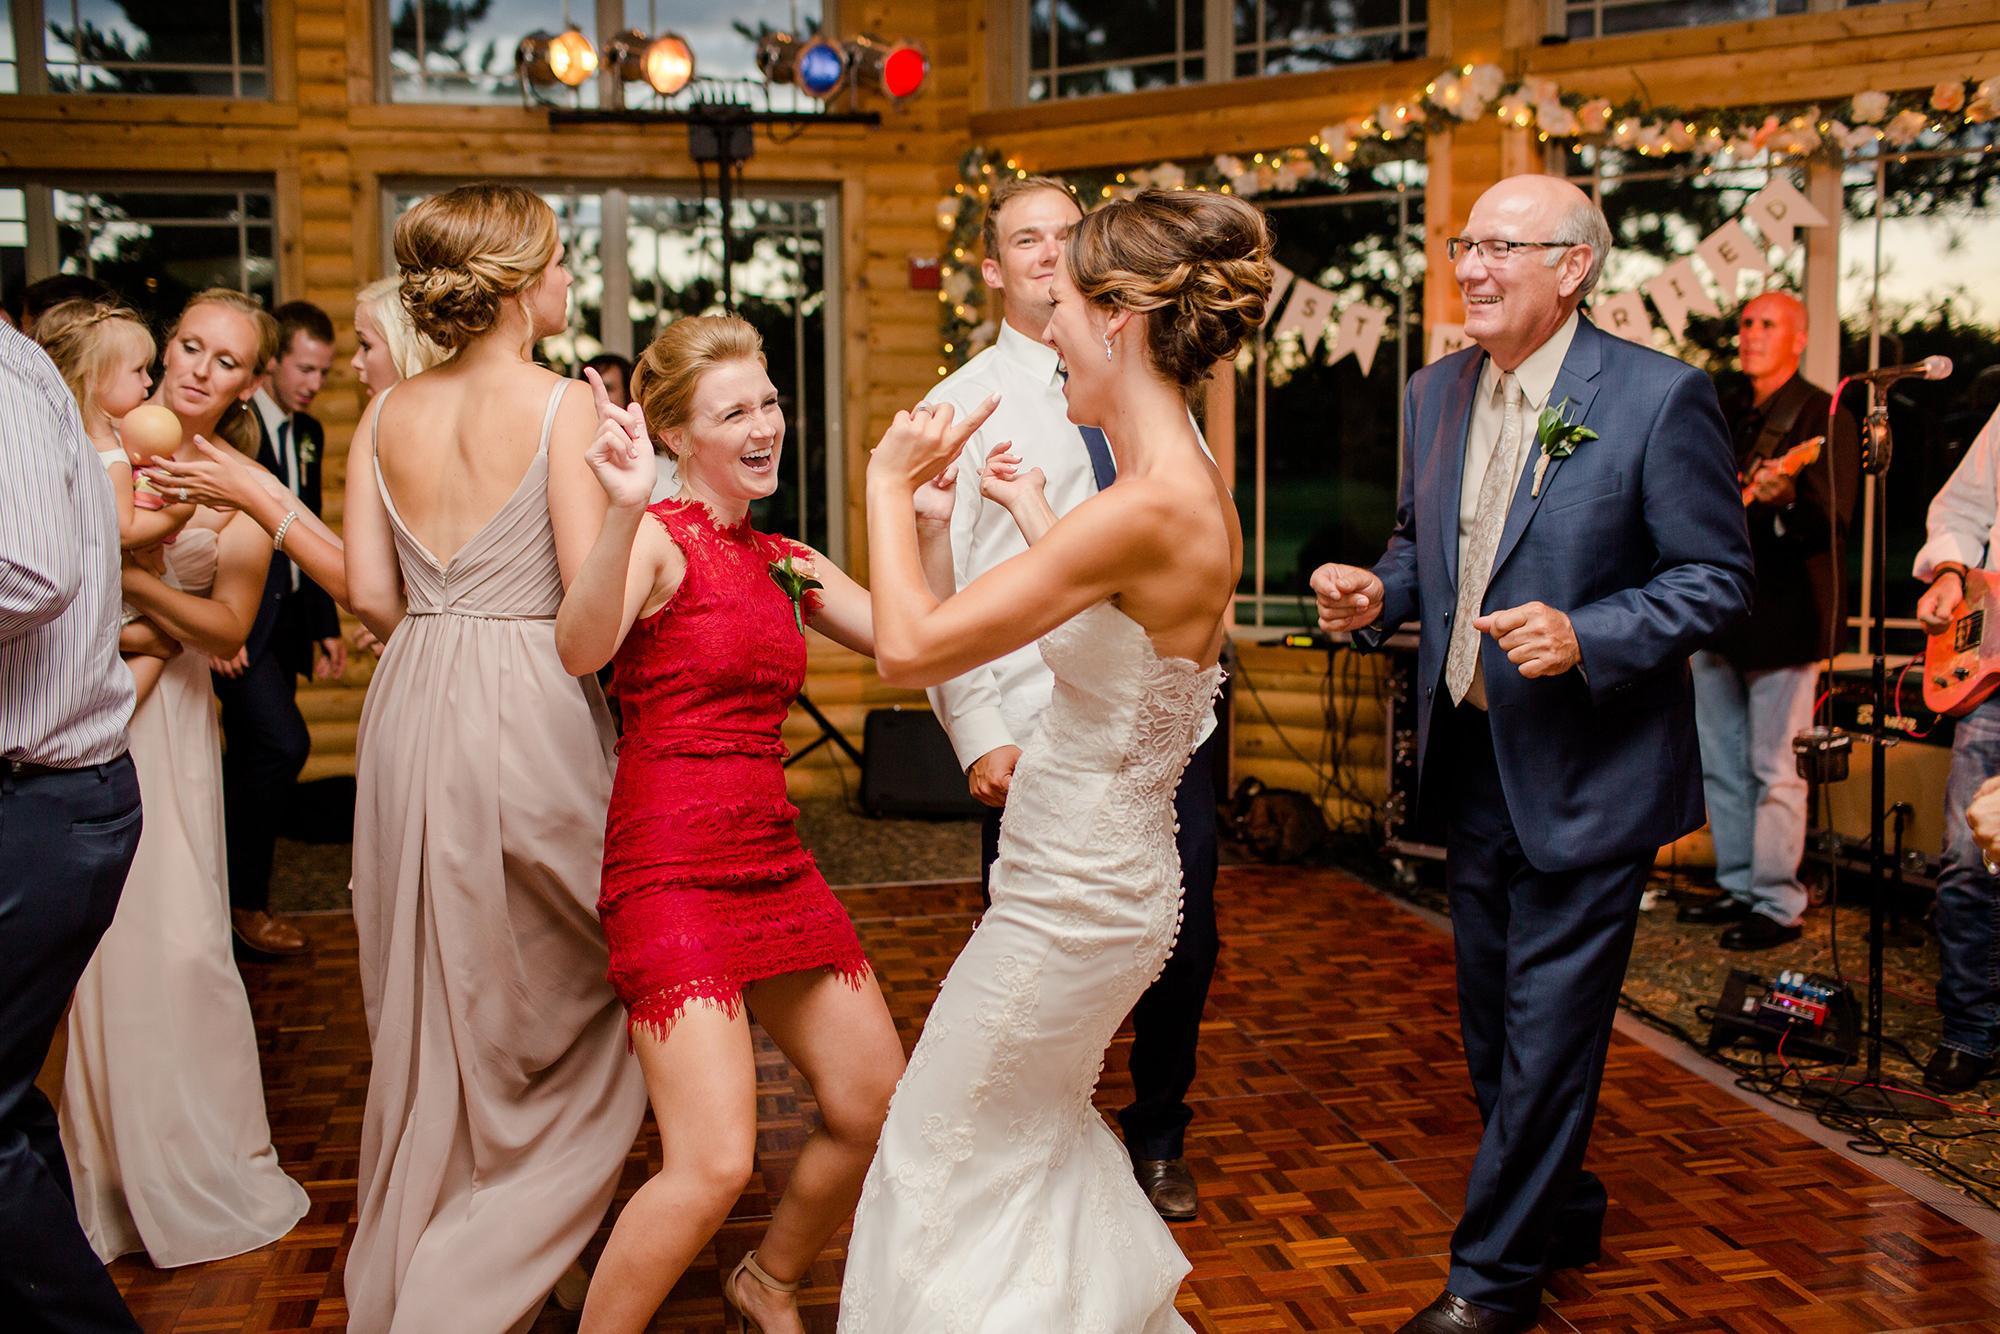 wedding dance at Thumper Pond